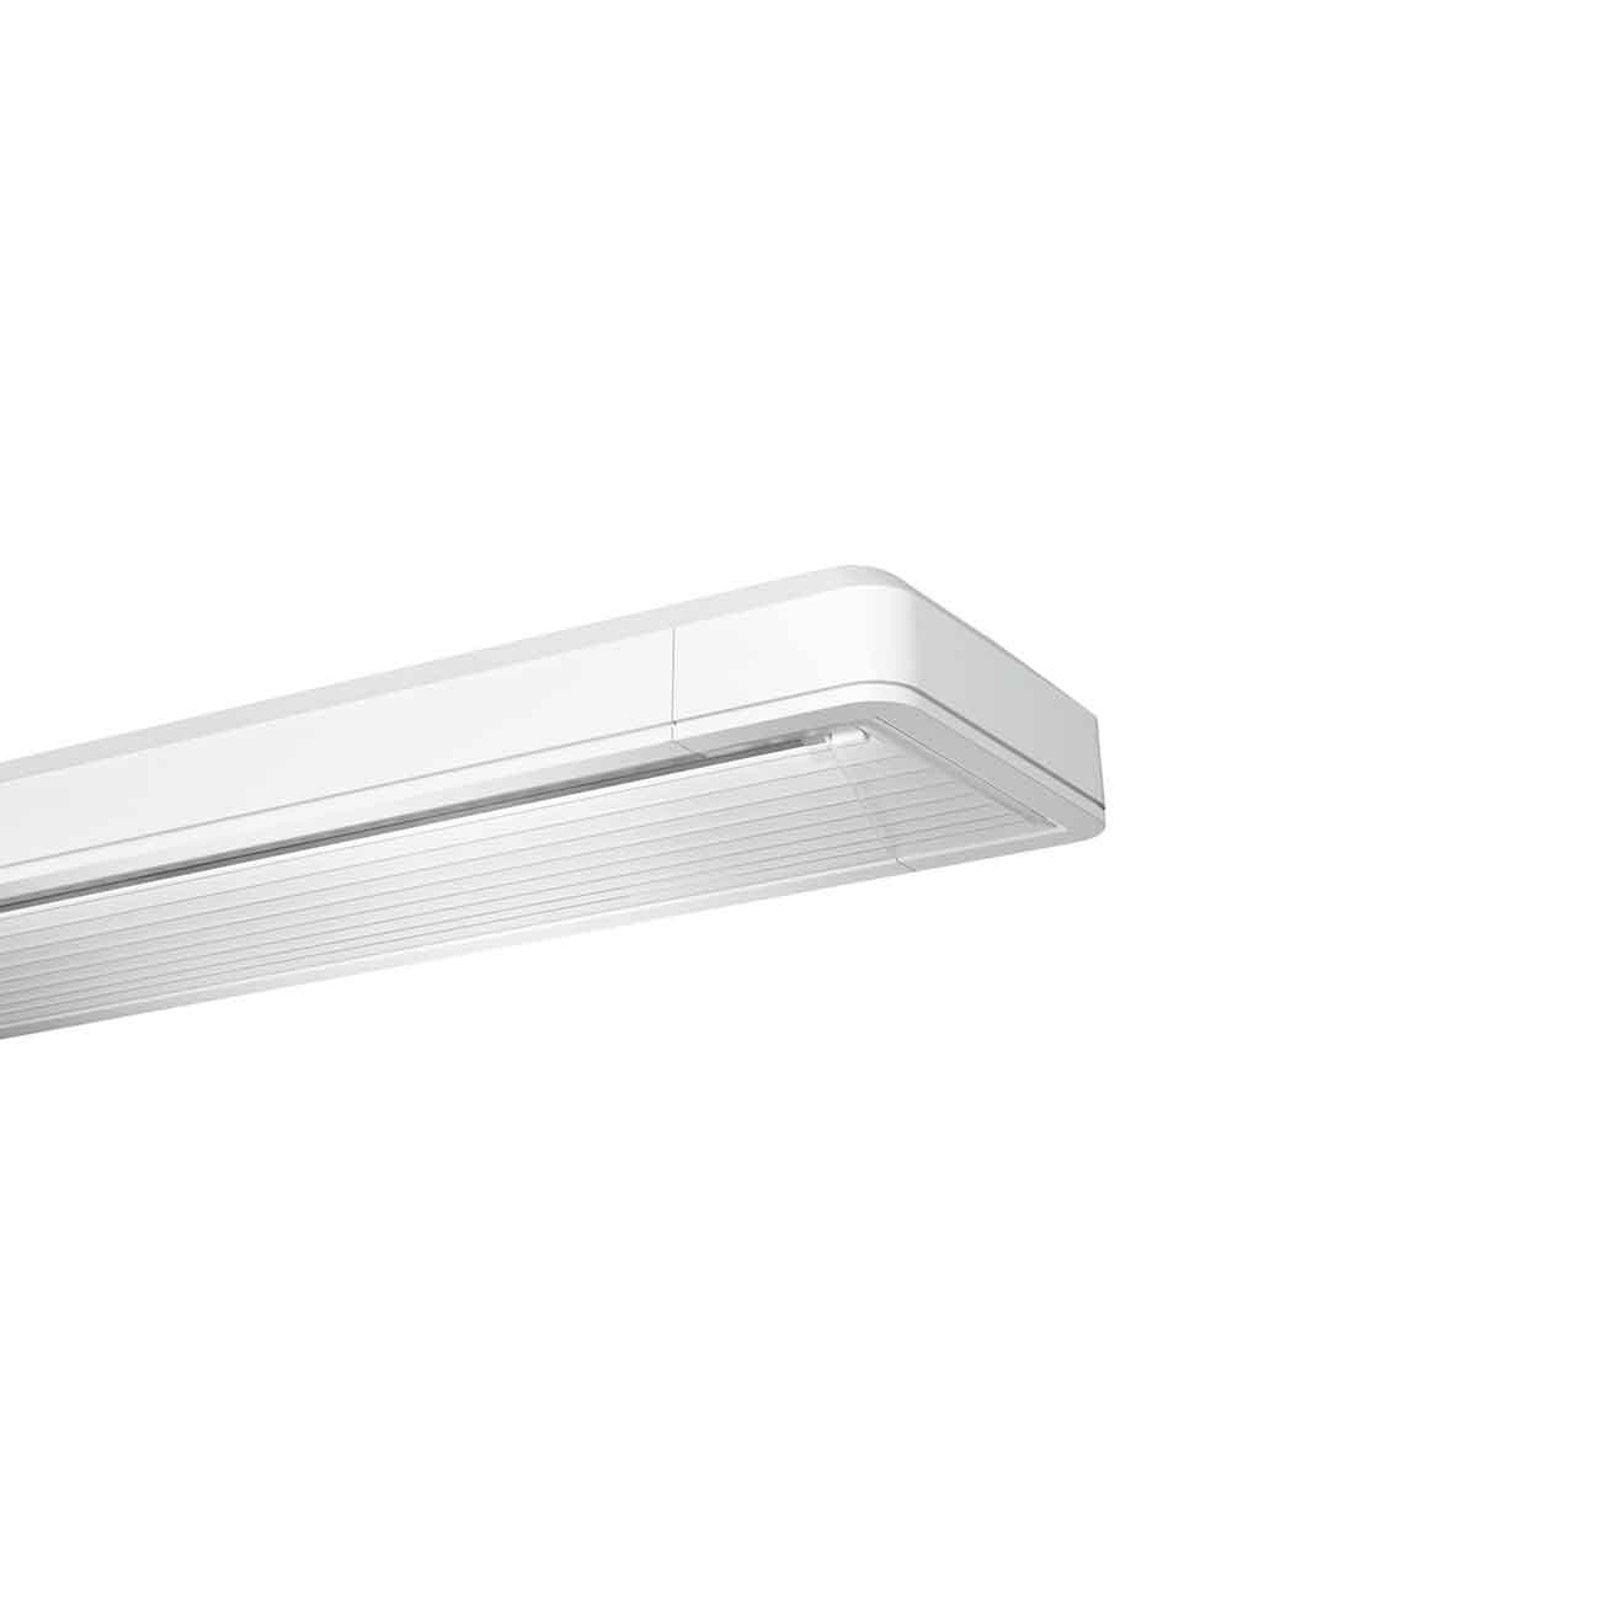 Siteco Taris LED-taklampe med 123 cm el. ballast